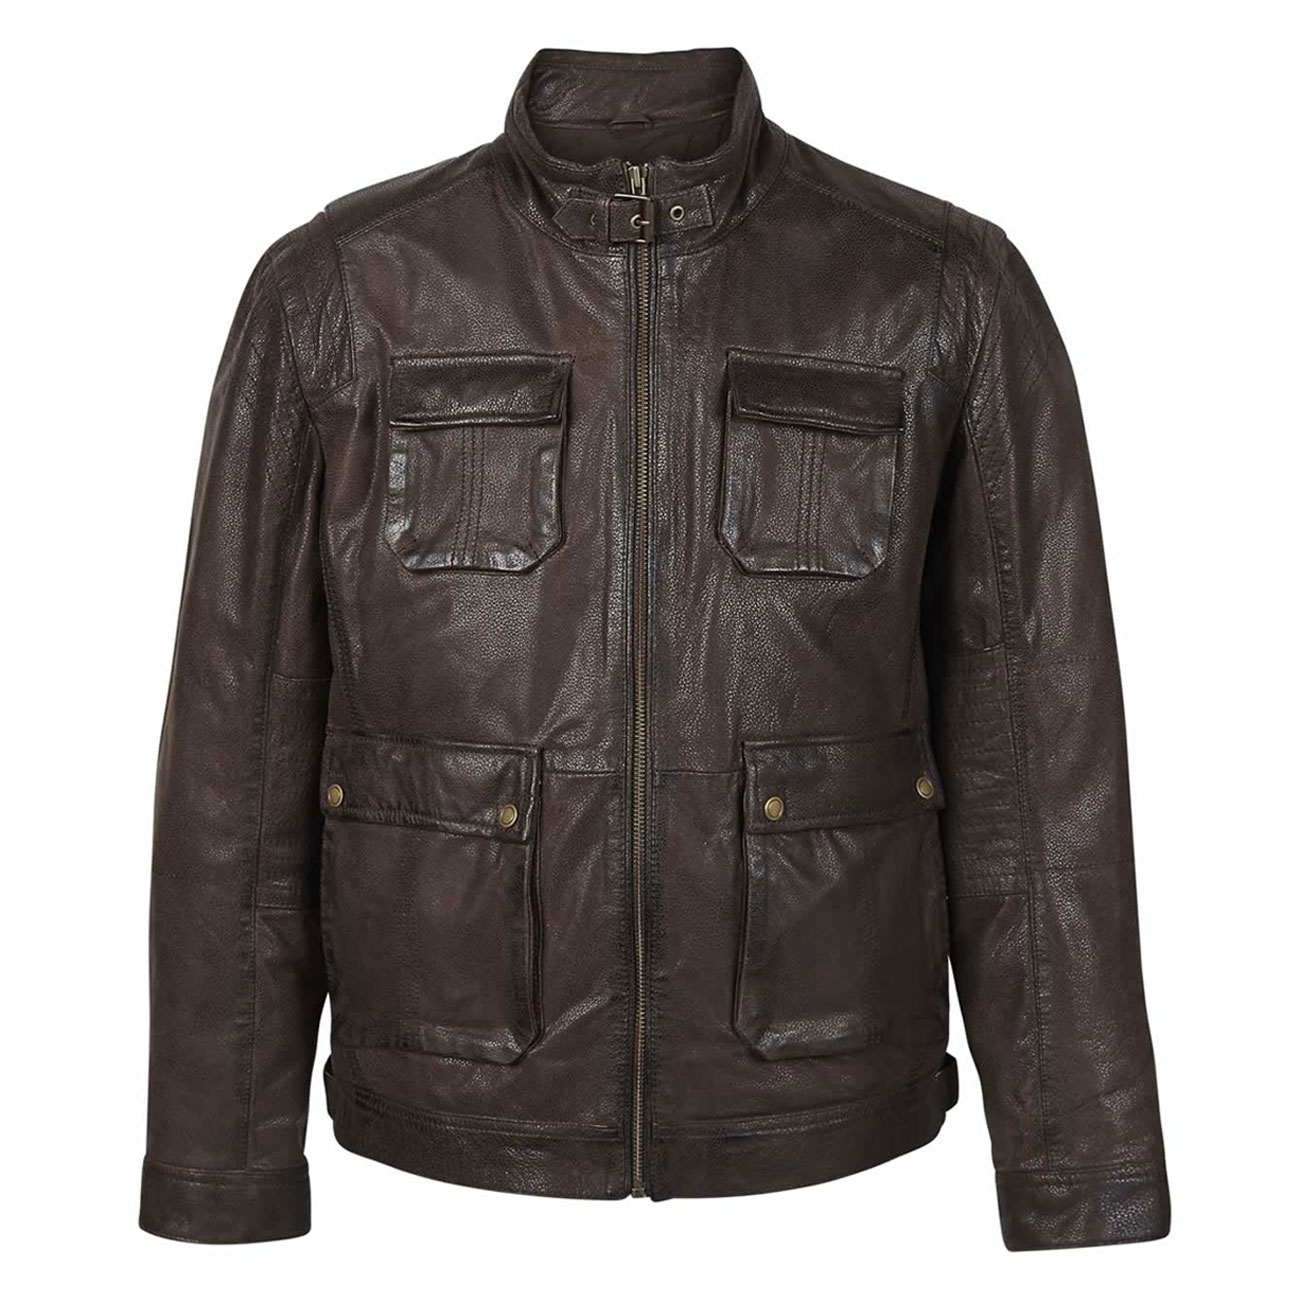 Gents Leather Jacket Brown Franco